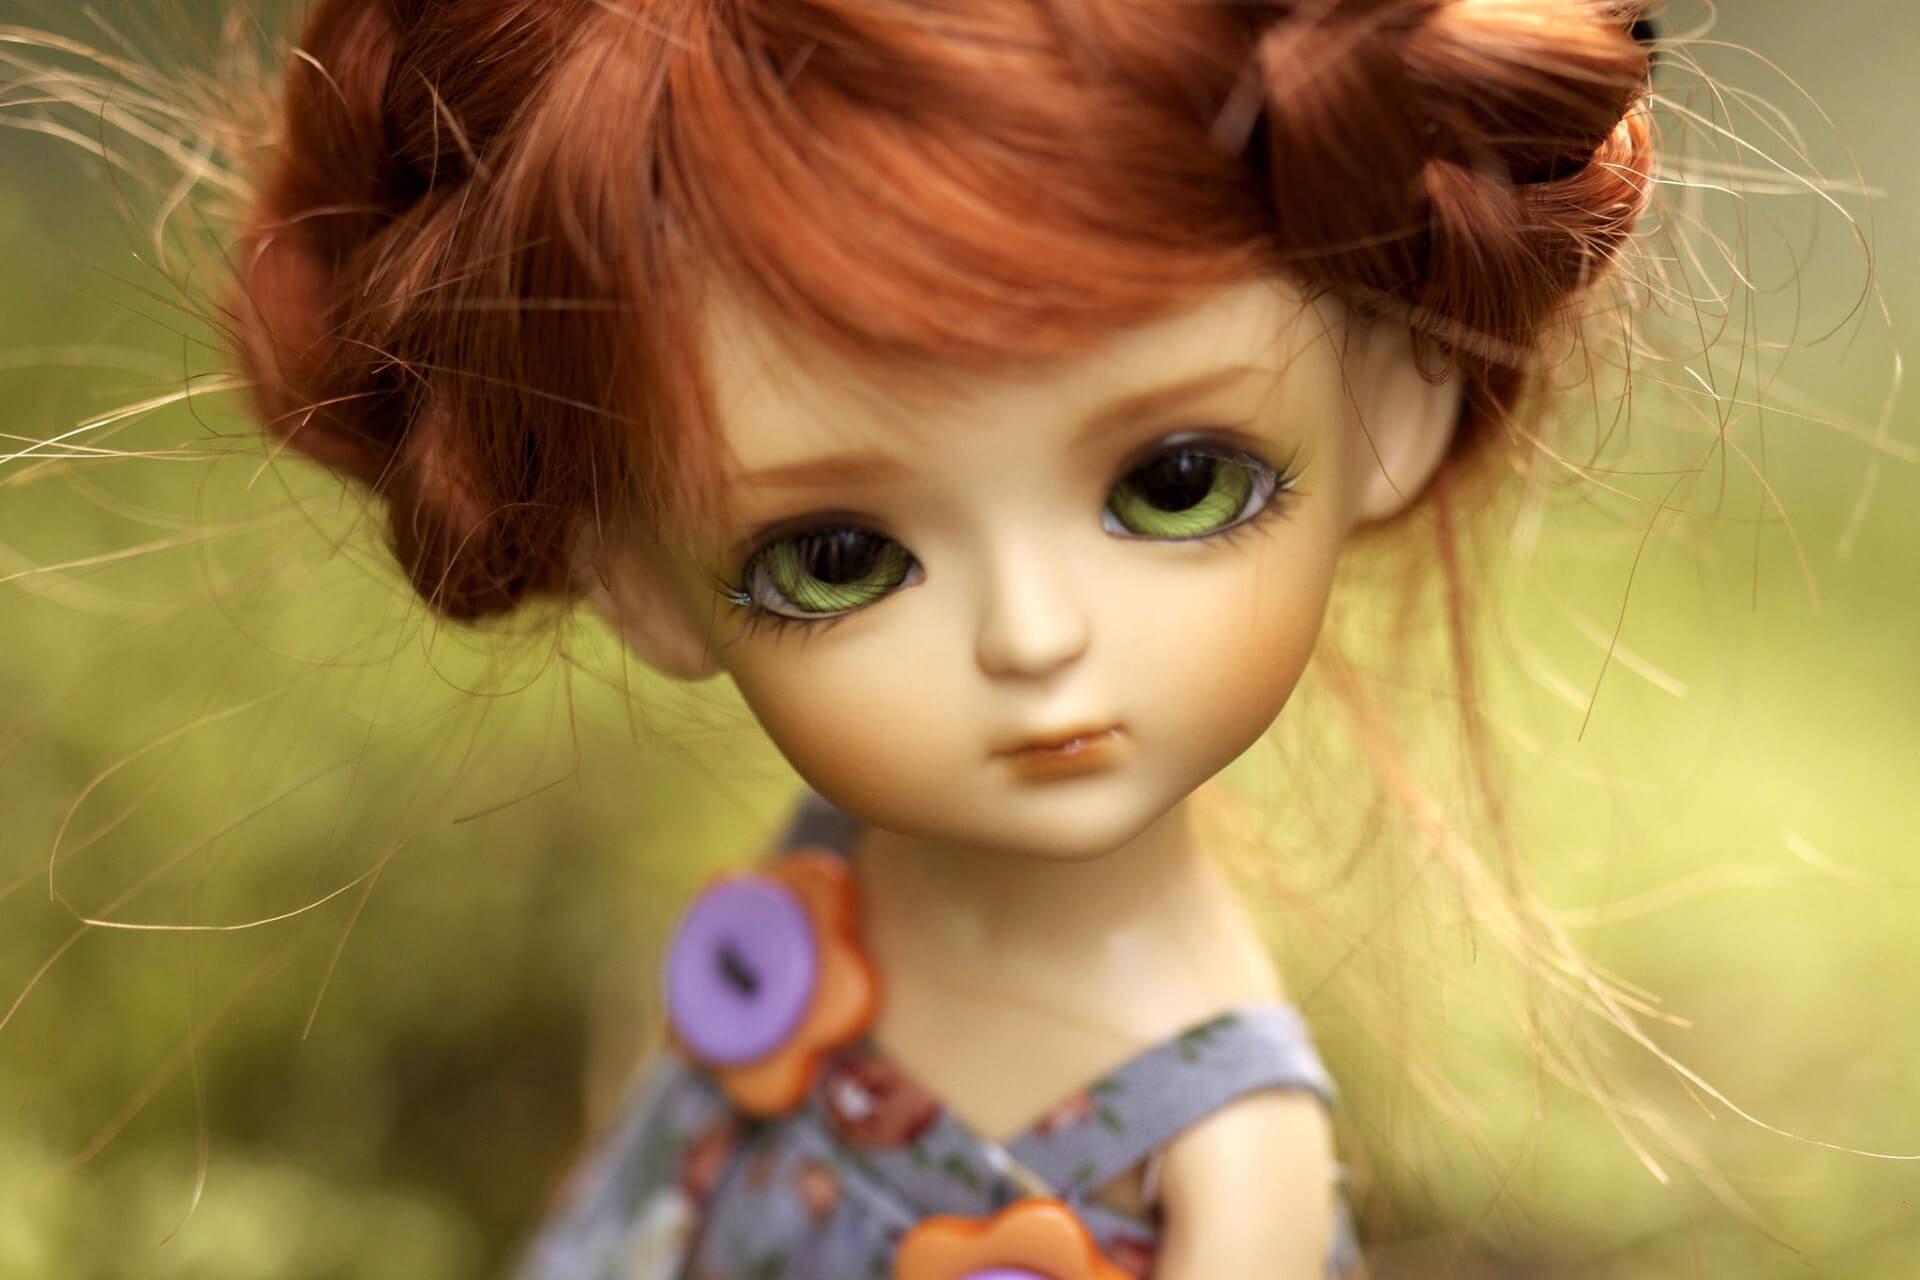 Girl child photos free download